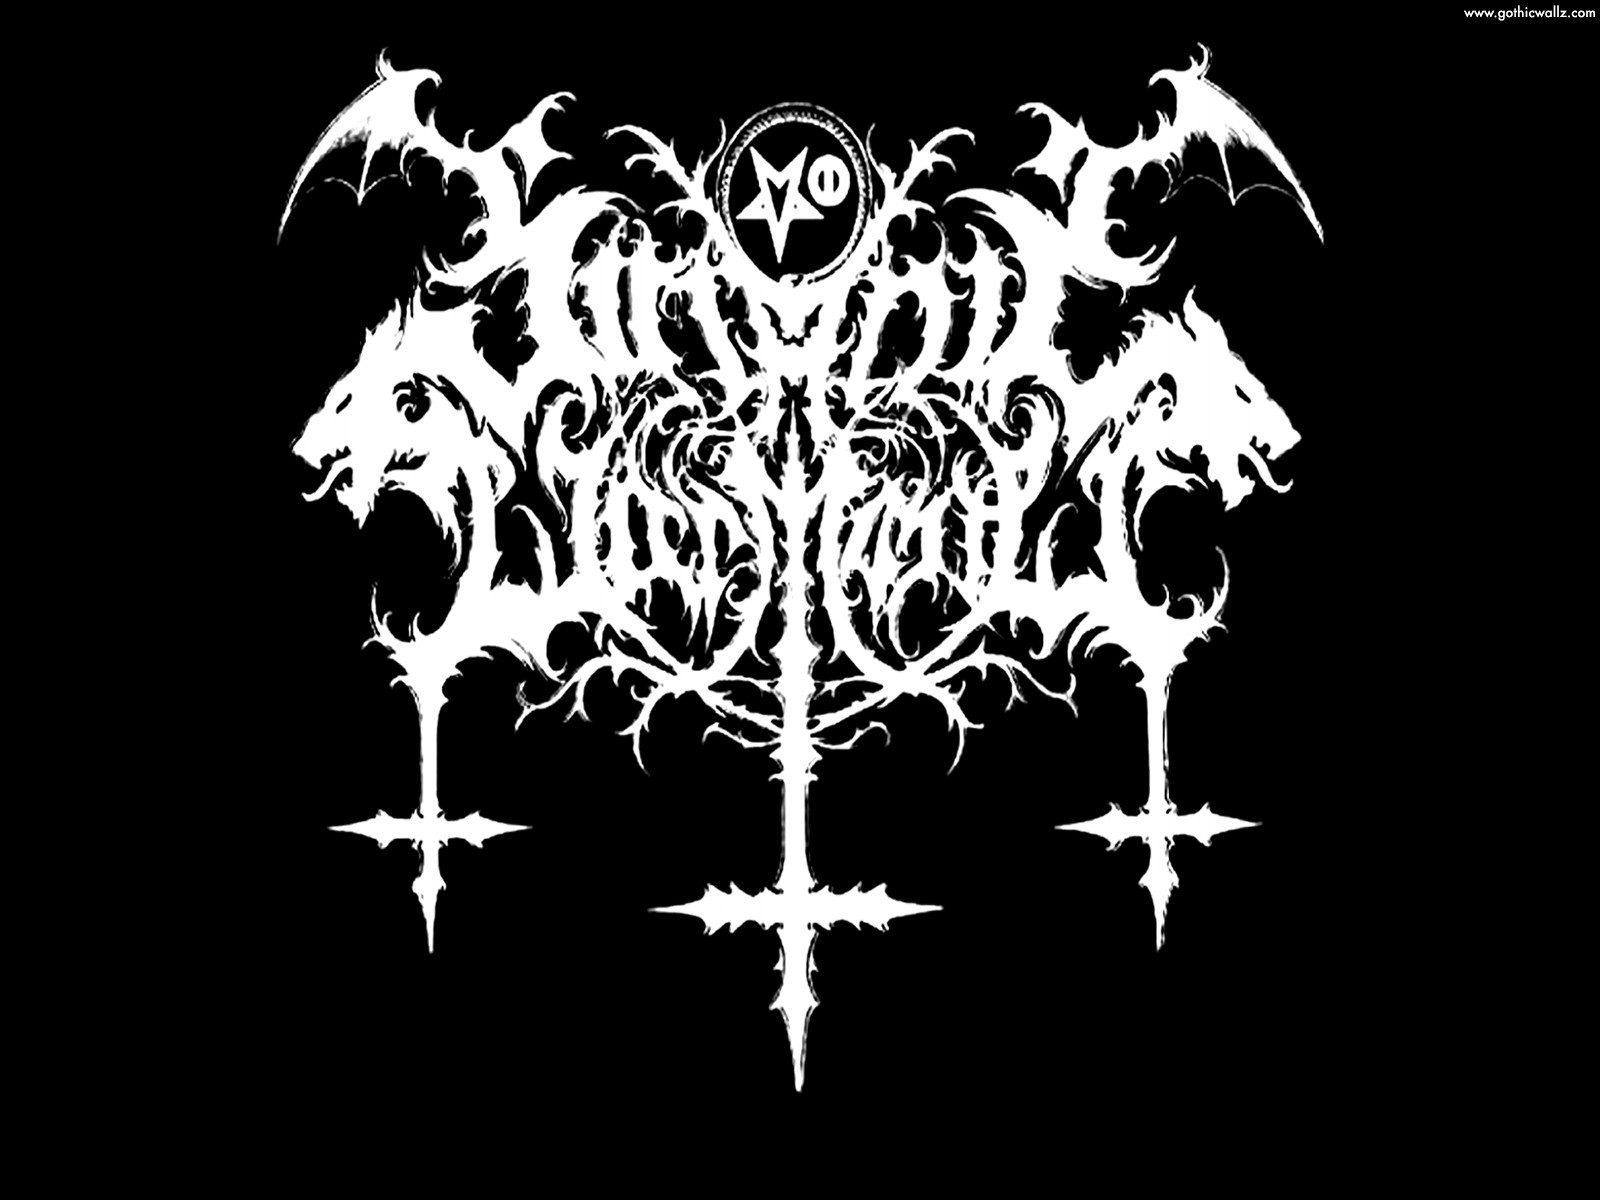 Satanic Iphone Wallpaper Satanic Wallpaper And Background Image 1600x1200 Id 167097